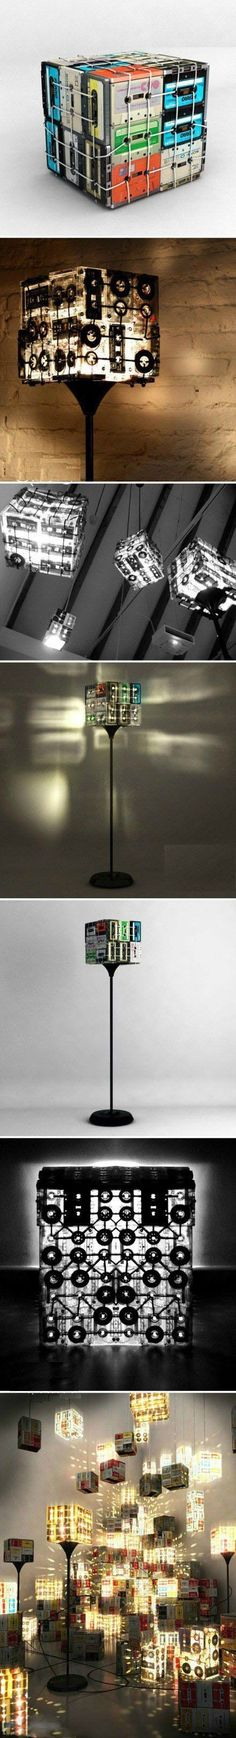 Homemade lamps from music cassettes- Selbstgemacht Lampen aus Musikkassetten Homemade lamps from music cassettes - Diy Luz, Craft Tutorials, Diy Projects, Craft Ideas, Diy Ideas, Decorating Ideas, Retro Lampe, Diy Luminaire, Ideias Diy